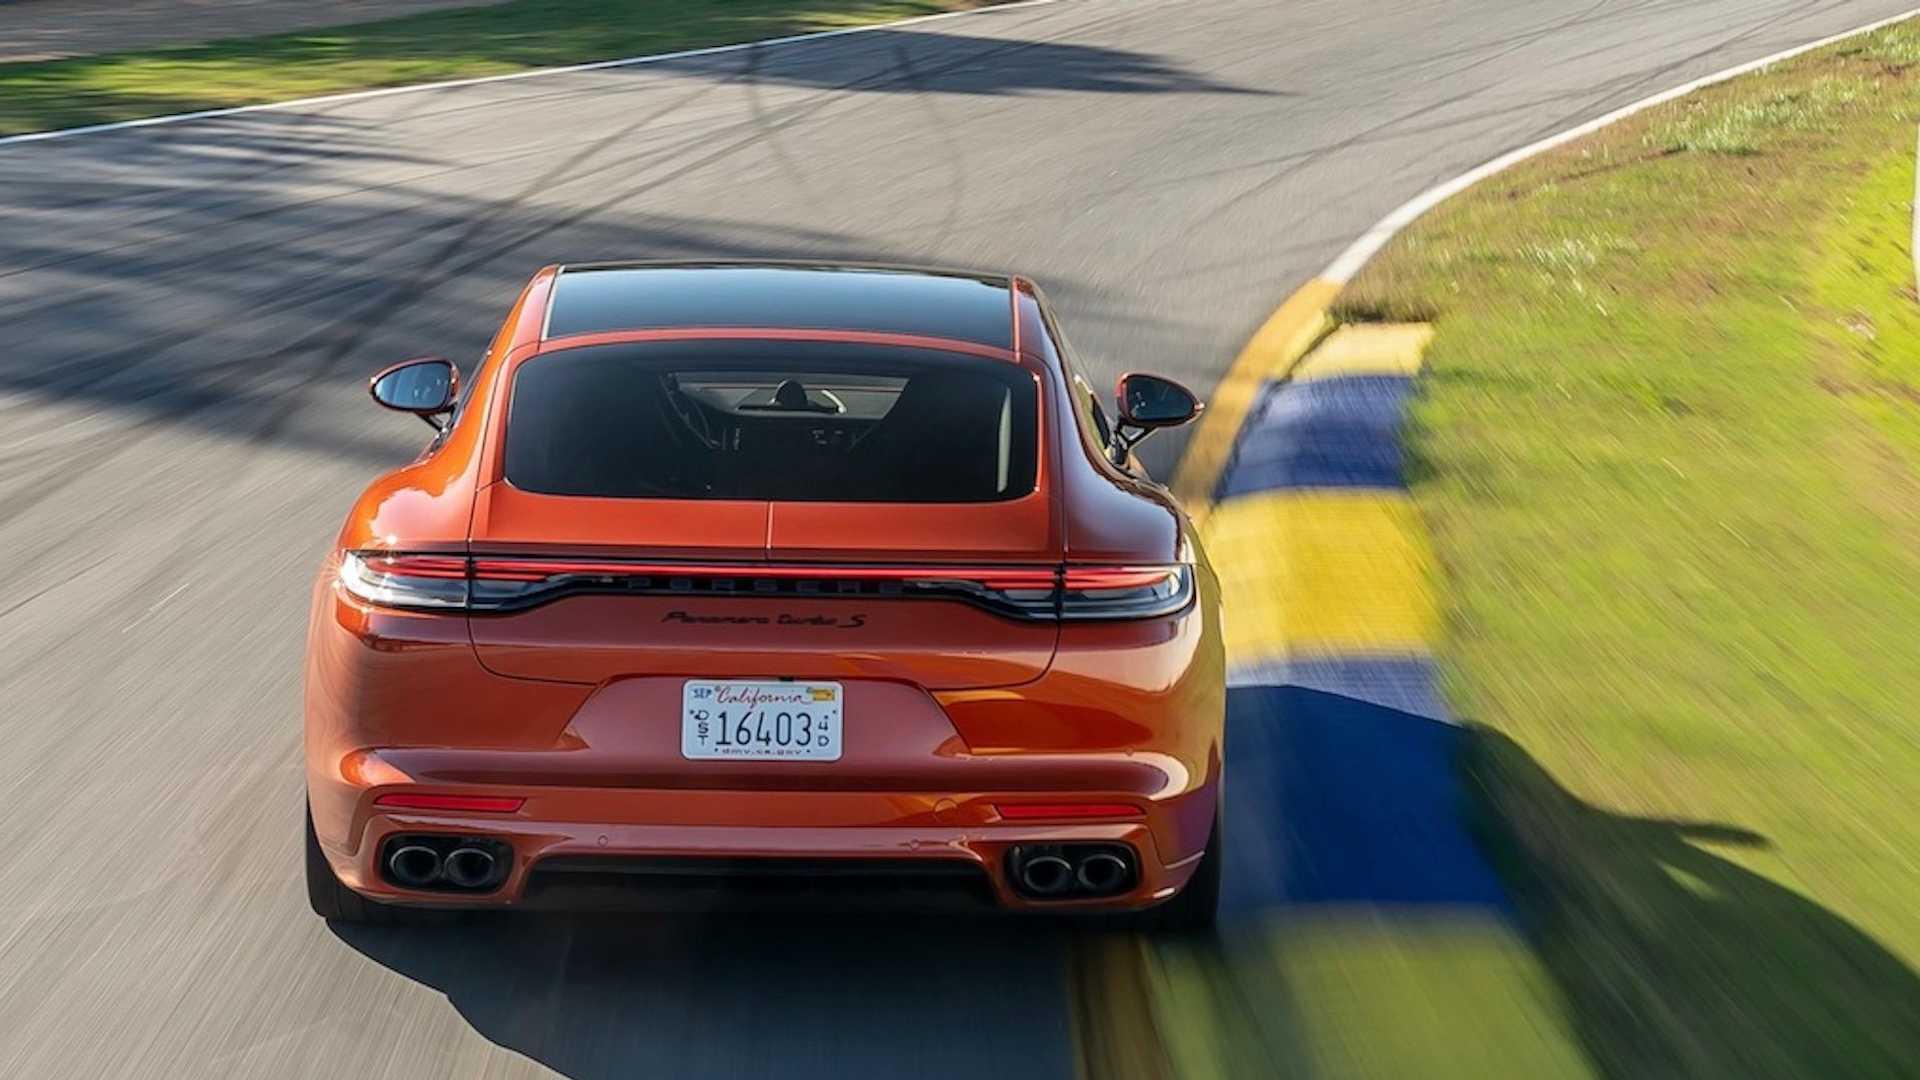 Porsche-Panamera-Turbo-Record-Road-Atlanta-12